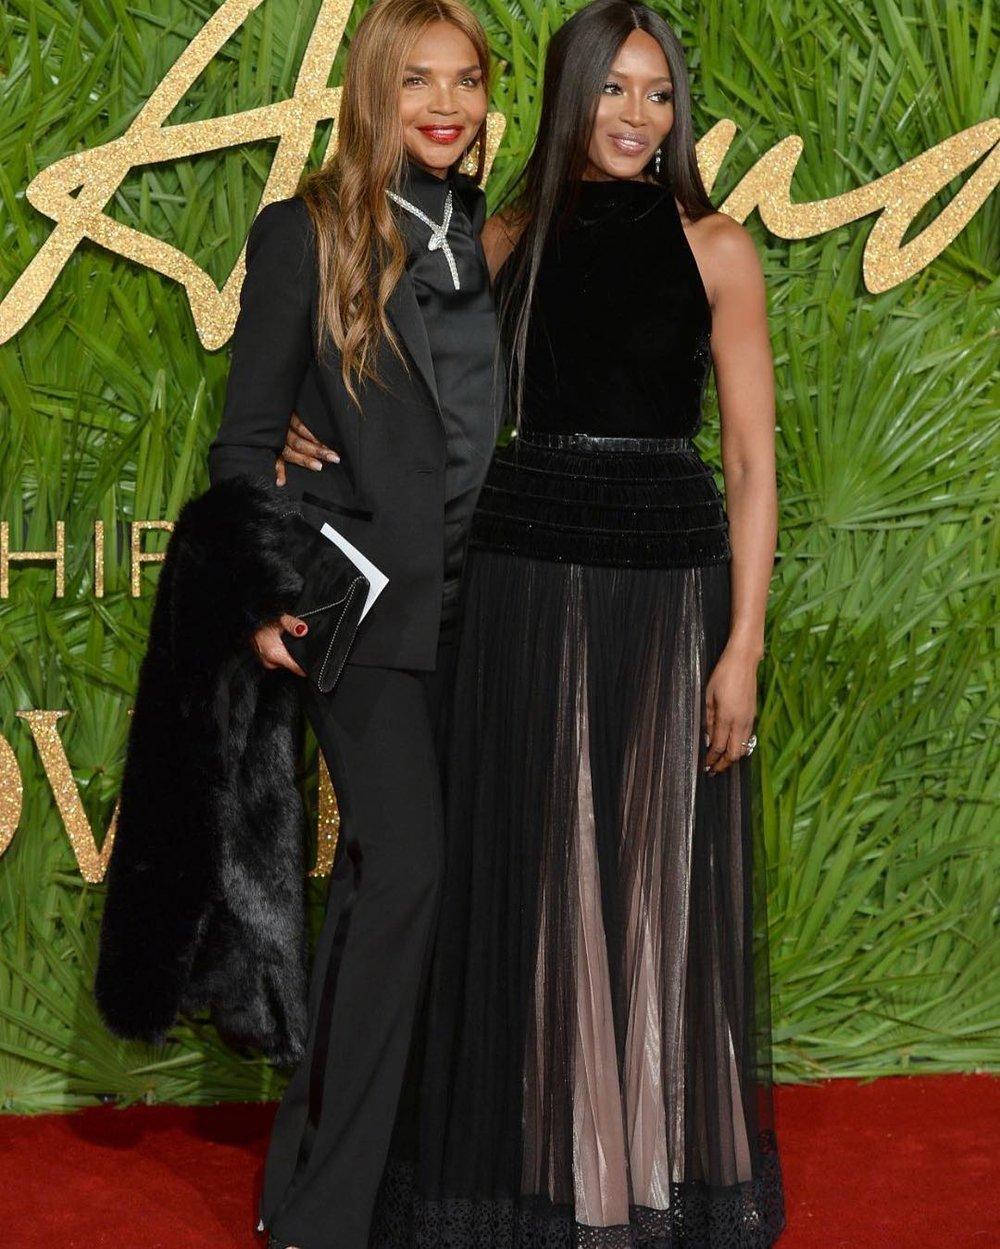 Naomi Campbell in Azzedine Alaïa and Bulgari jewellery.